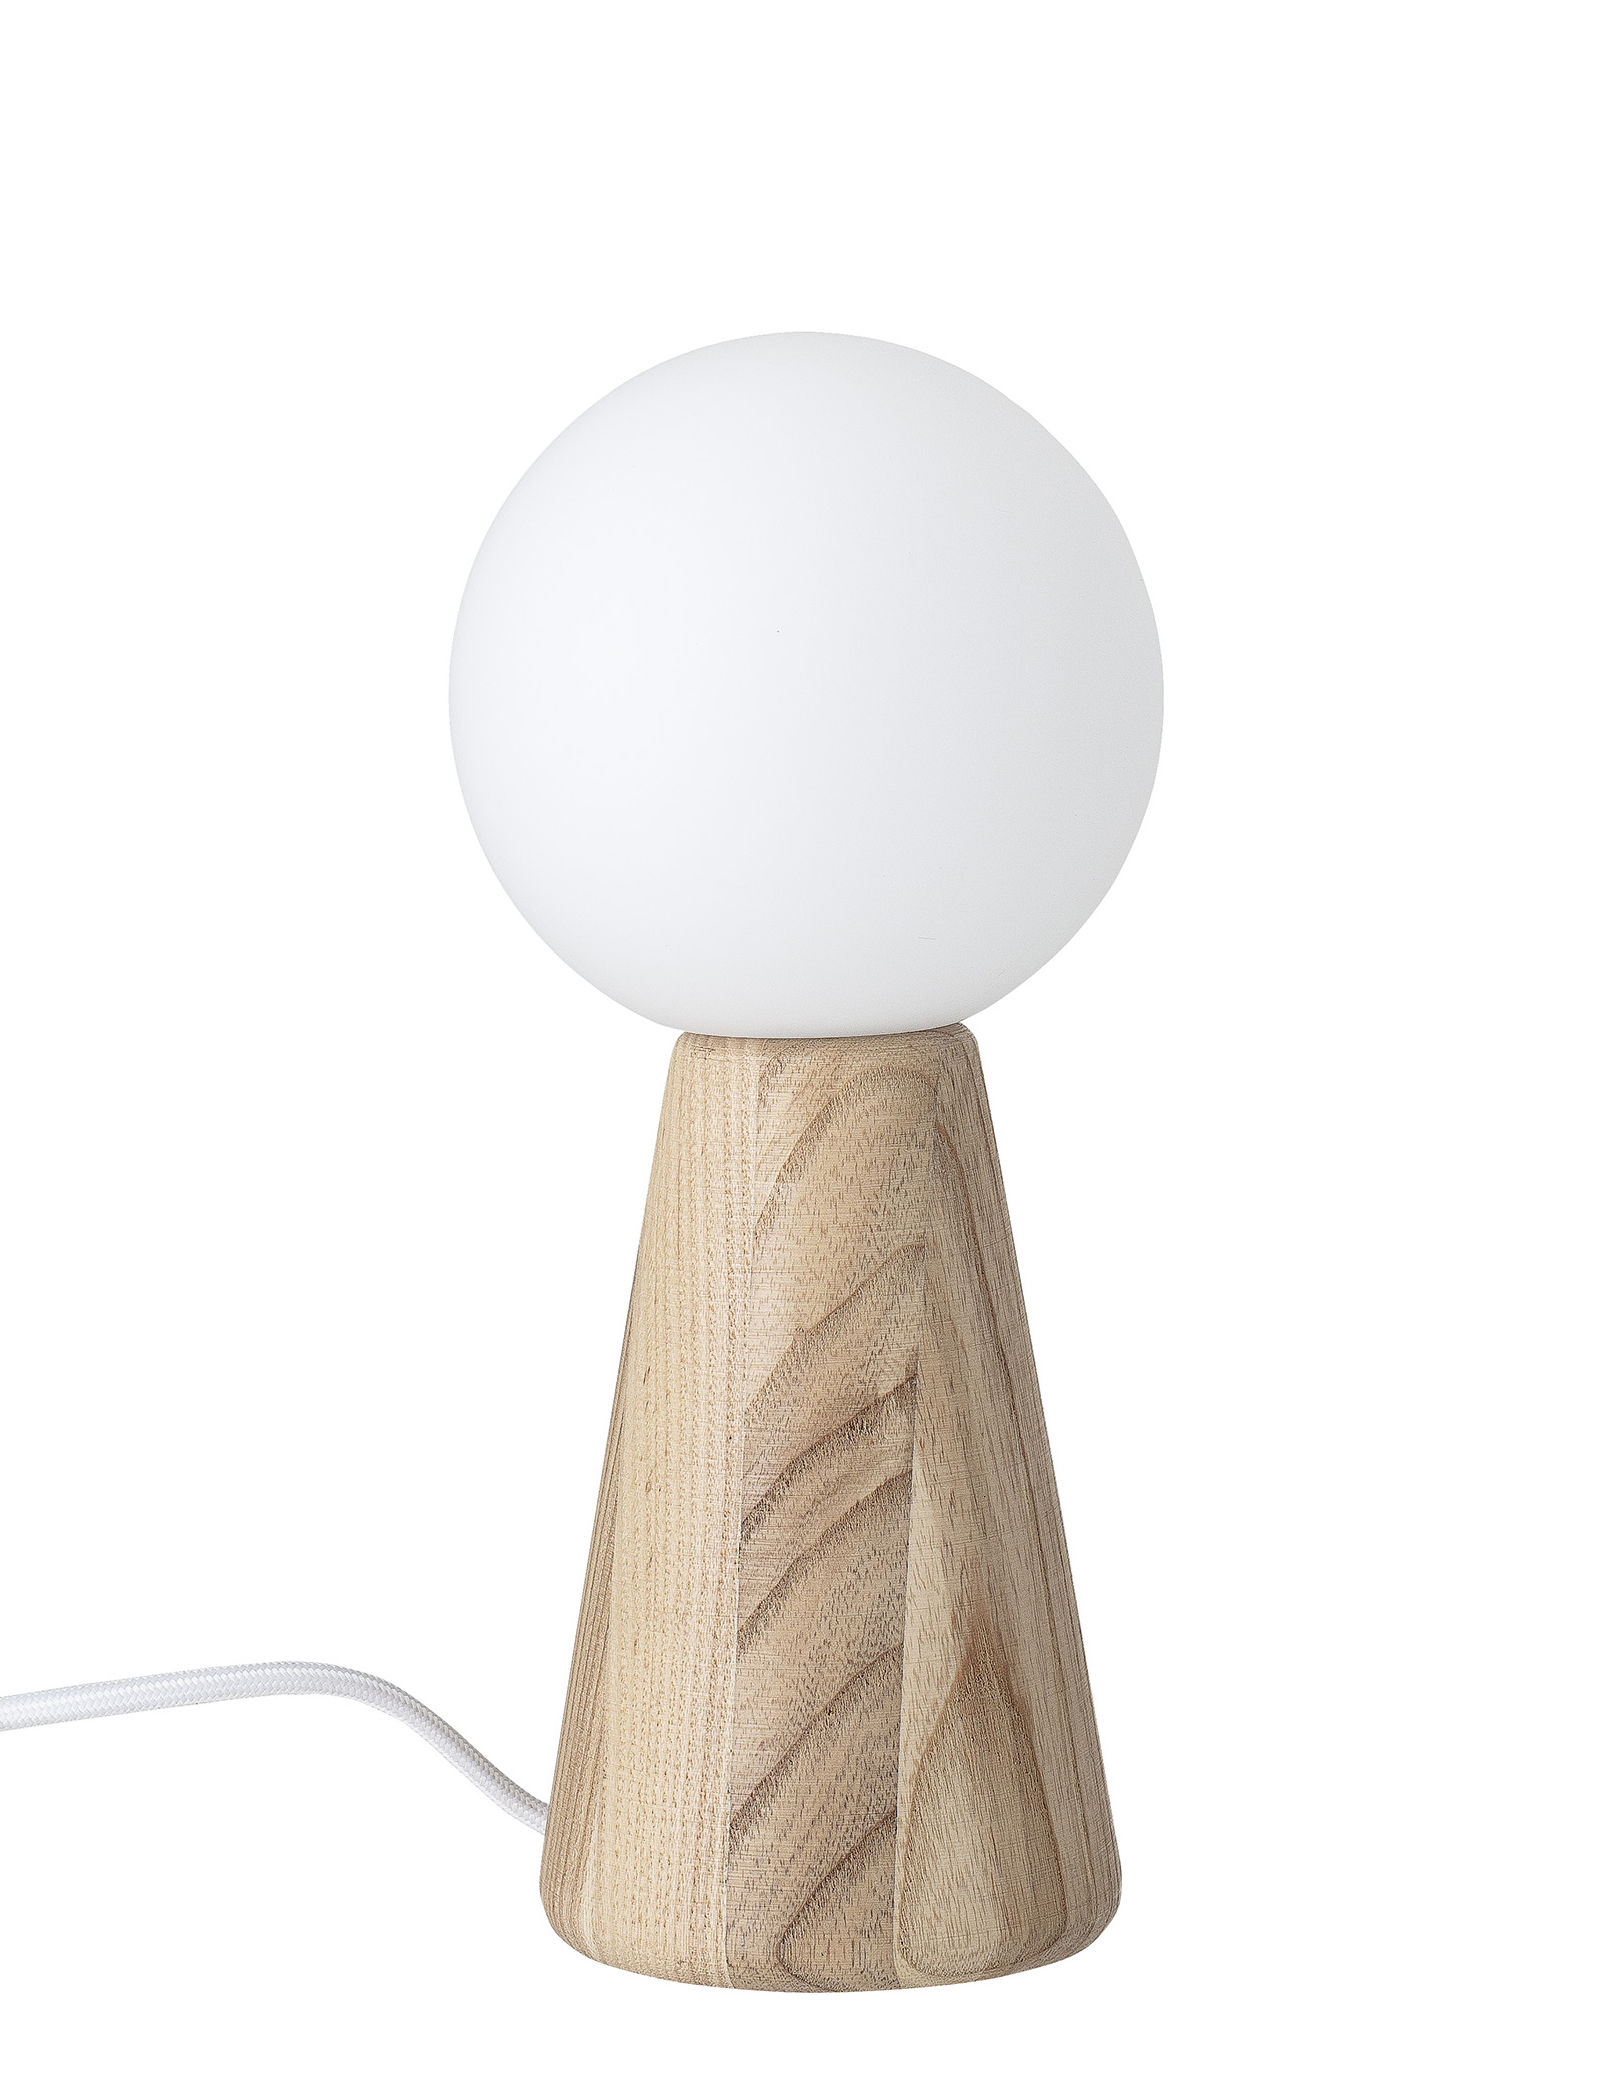 Luminaire - Lampes de table - Lampe de table / Bois - Bloomingville - Frêne naturel - Frêne, Verre opalin